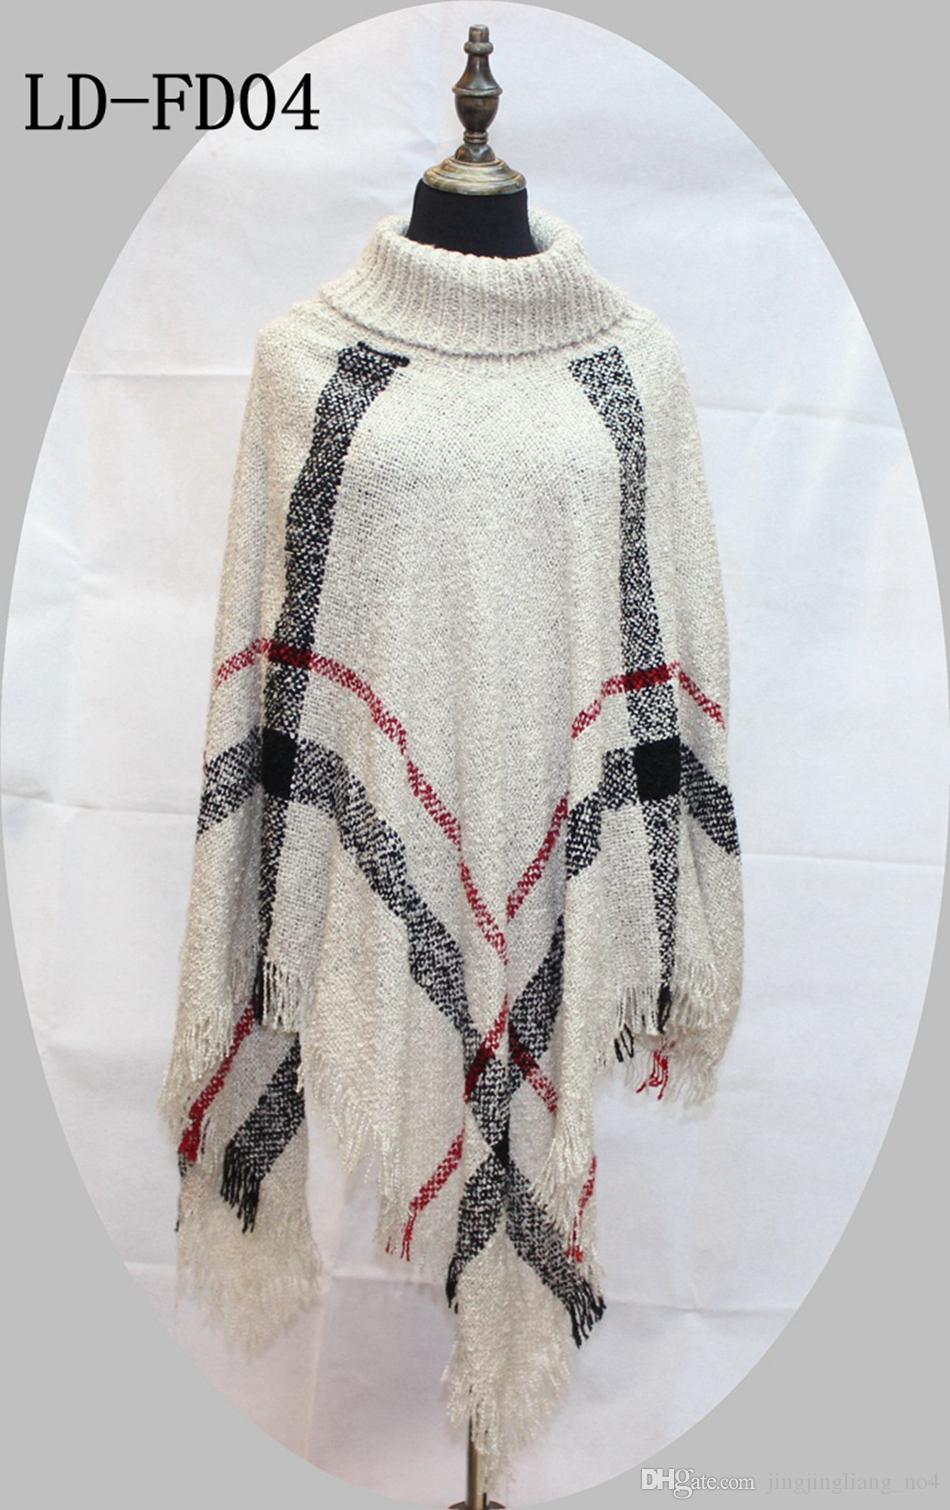 Poncho xadrez Mulheres Borla Blusa De Malha Casaco Camisola Do Vintage Wraps Malha Cachecóis Tartan Inverno Cape Grid Xaile Cardigan Manto OOA2903